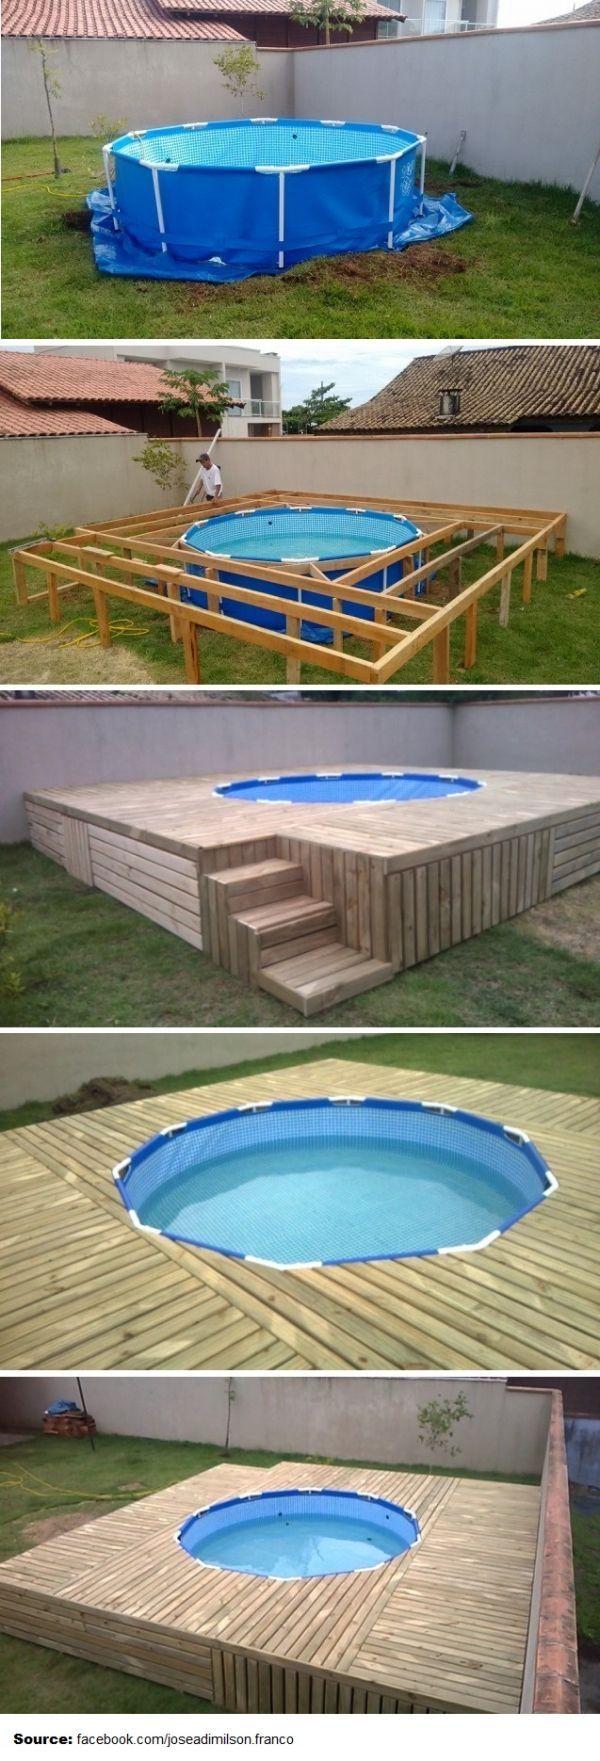 Budget-Friendly Swimming Pool Deck By José Adimilson Franco | WoodworkerZ.com